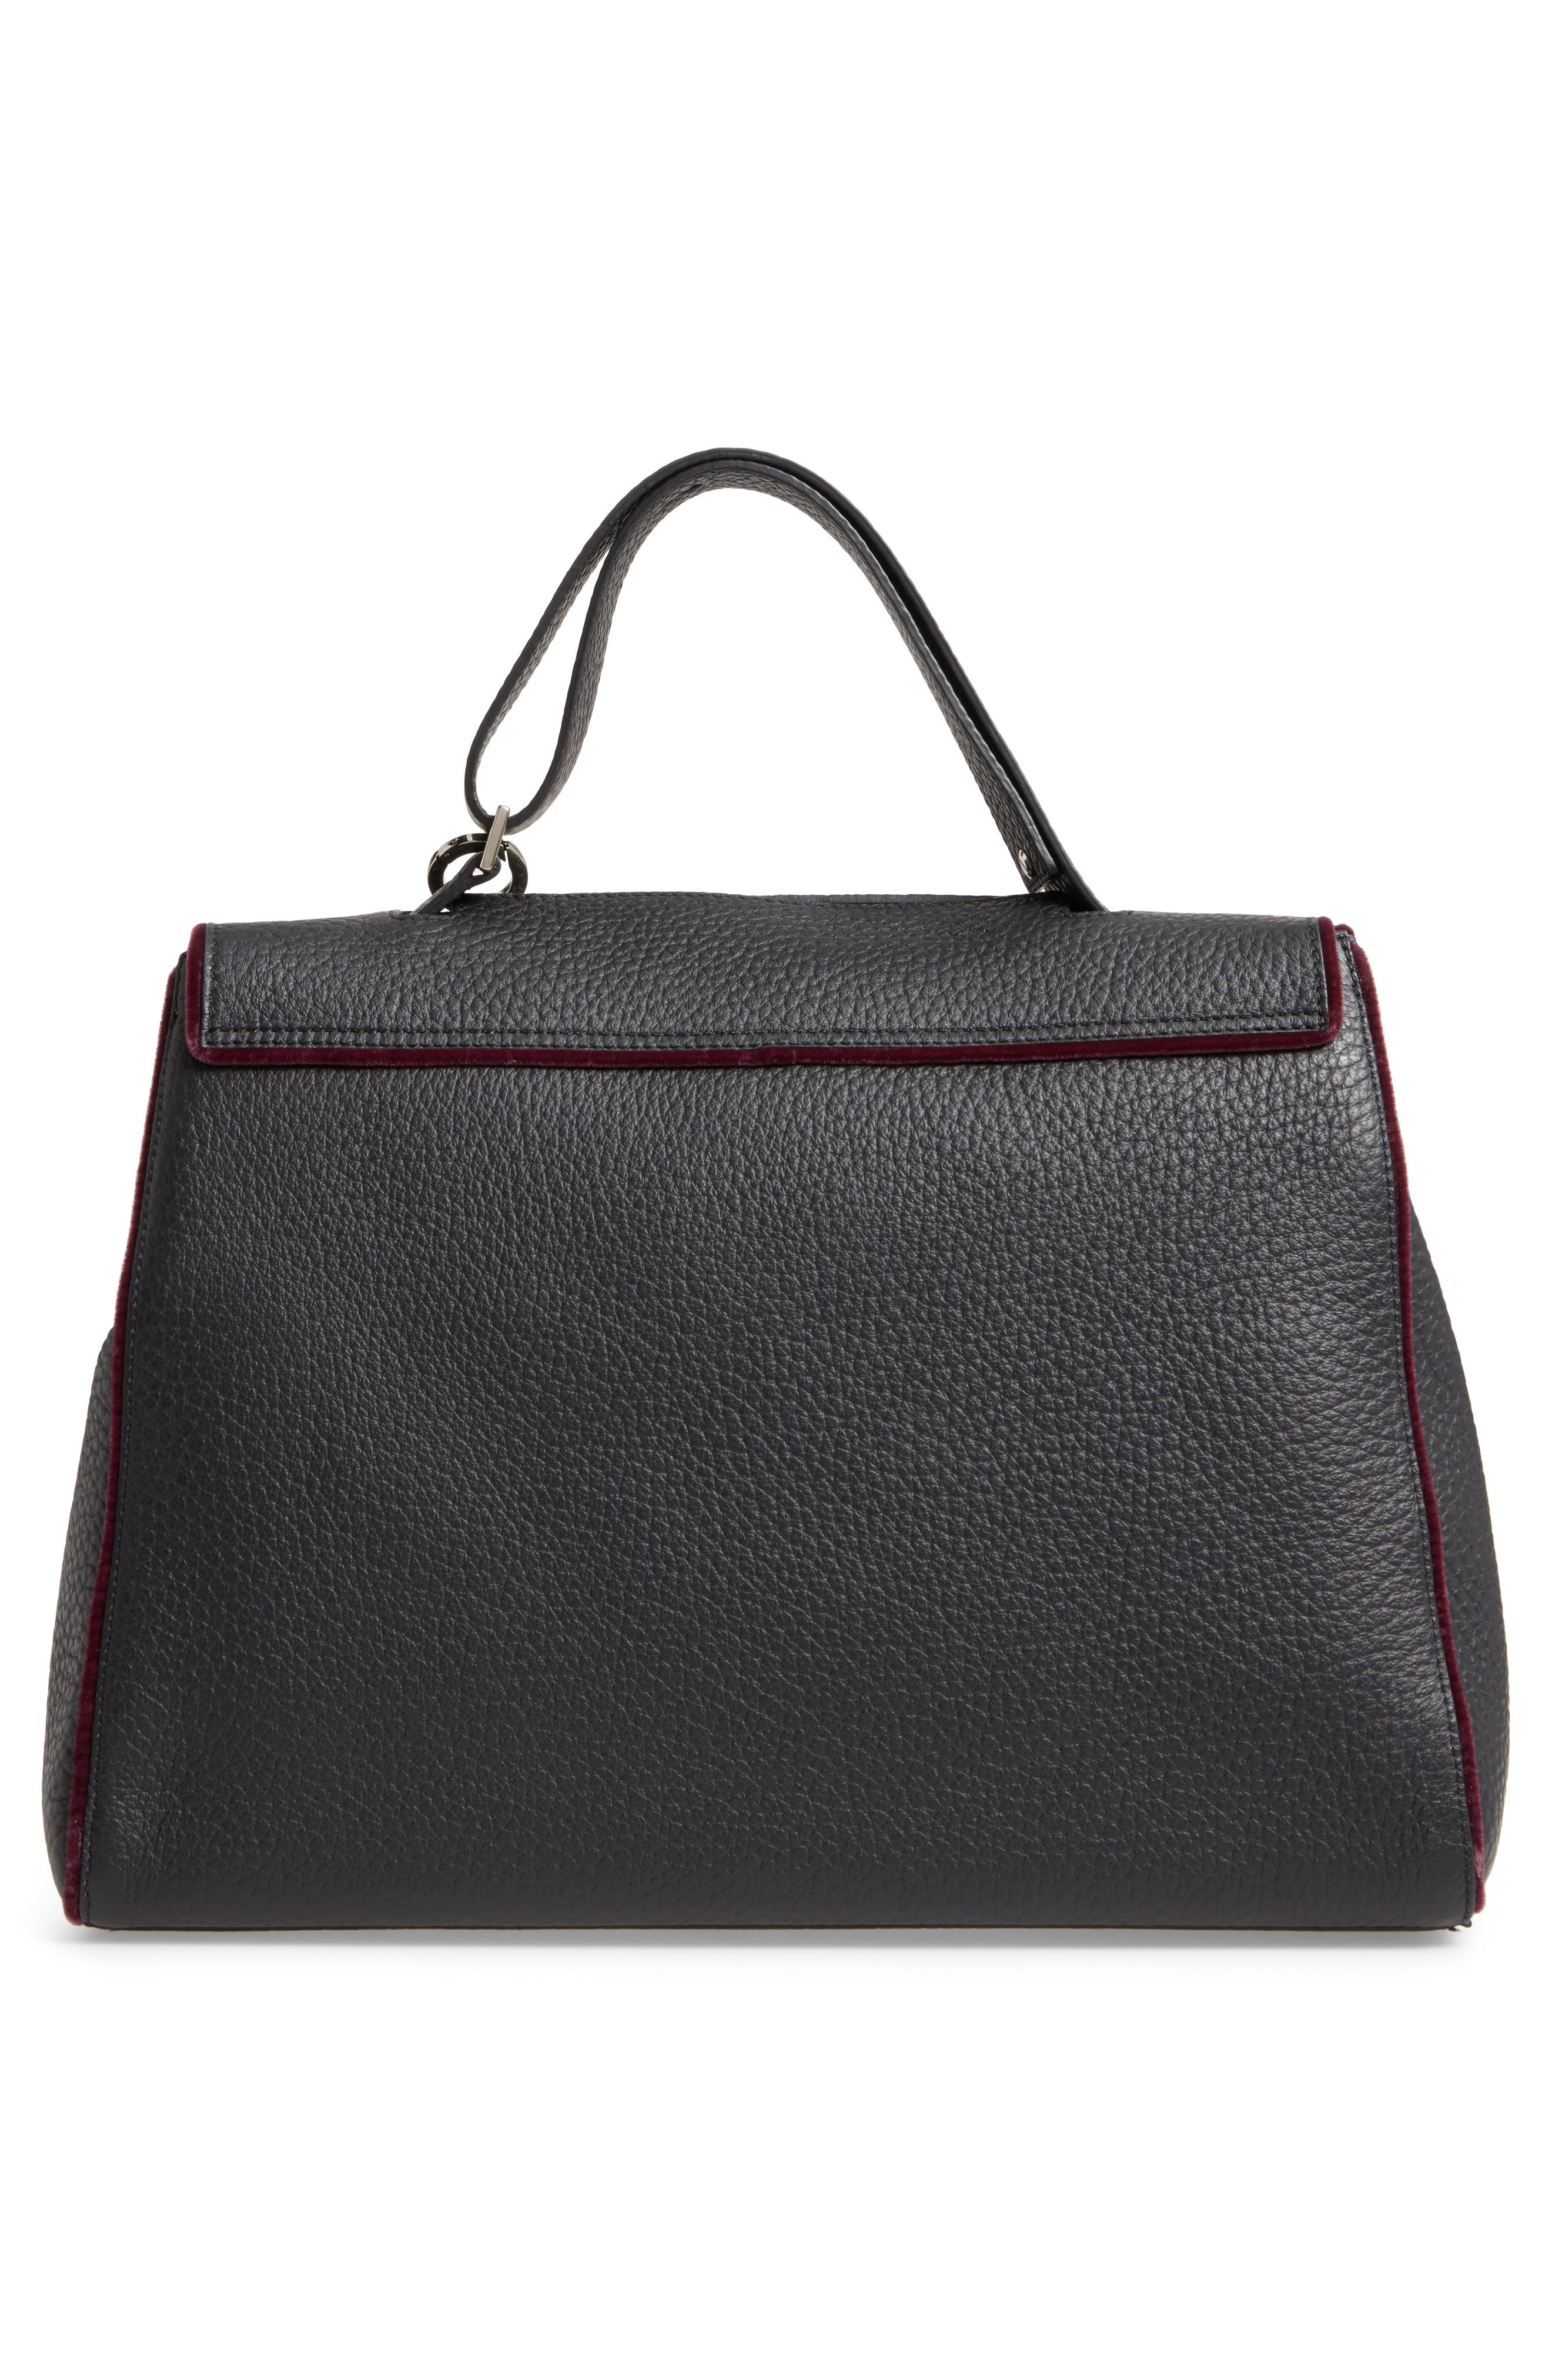 Alternate Image 2  - Orciani Large Sveva Soft Leather Top Handle Satchel with Genuine Fur Bag Charm